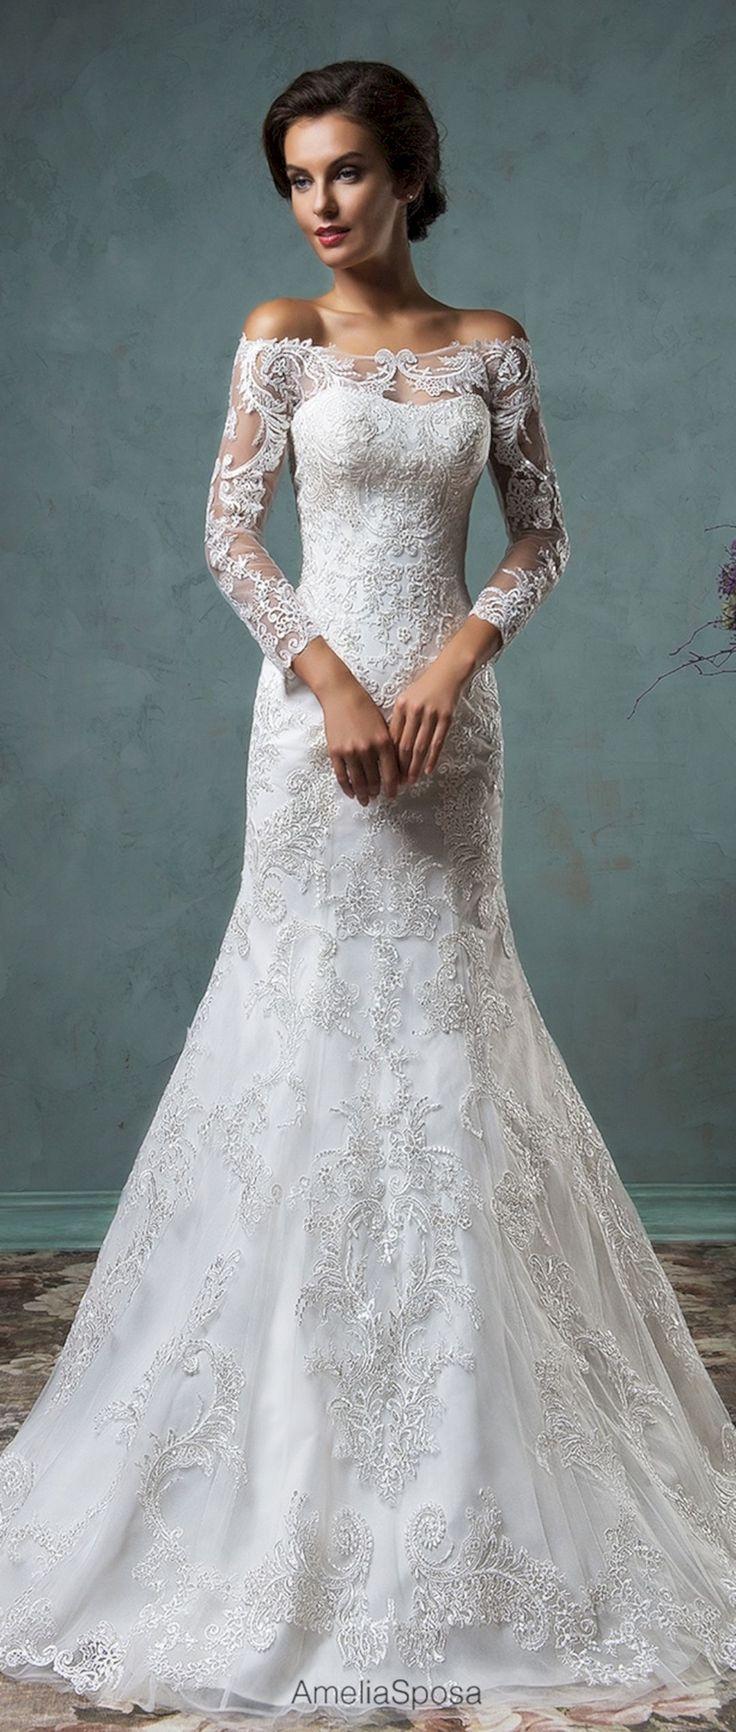 Nice 20+ Exclusive Amelia Sposa Wedding Dress Collections  https://oosile.com/20-exclusive-amelia-sposa-wedding-dress-collections-16204